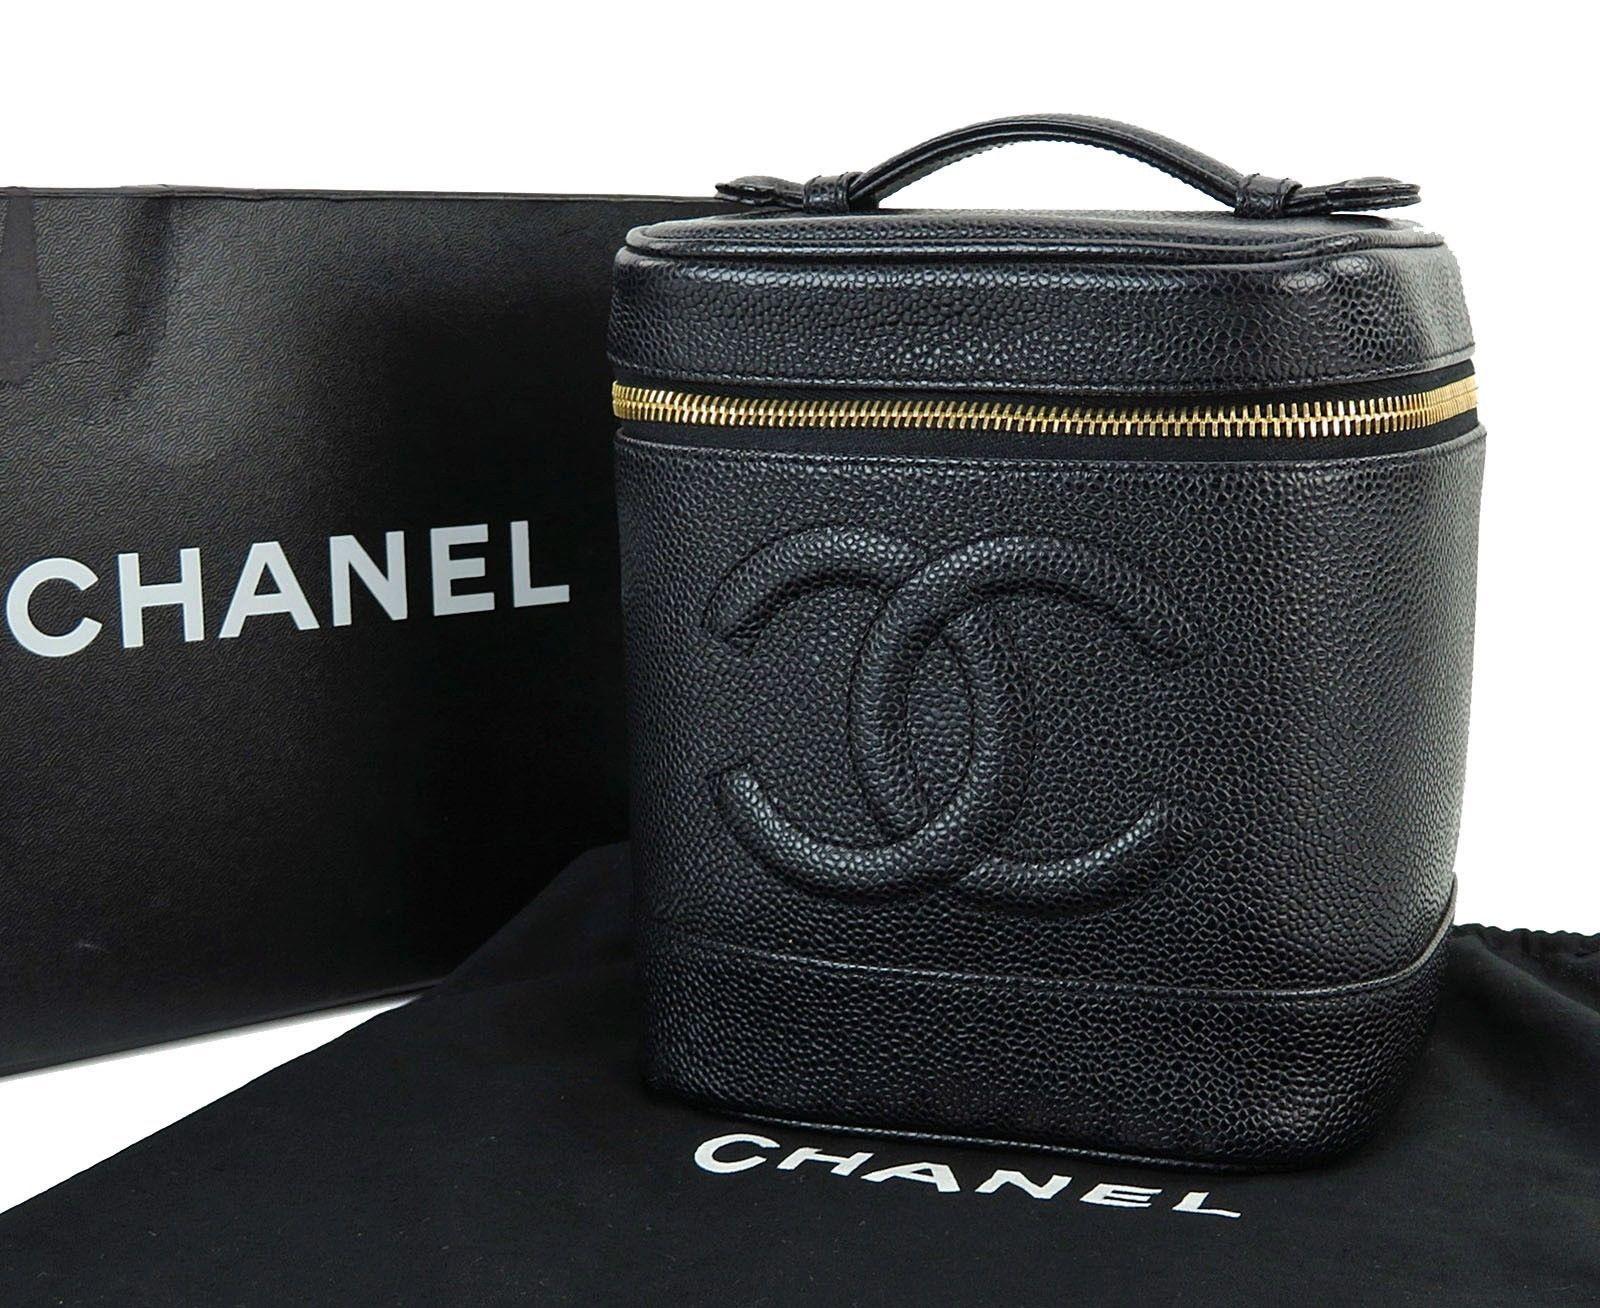 76e8e896a27558 Auth CHANEL Black Caviar Leather Cosmetics Pouch Vanity Case Travel Bag  #27311